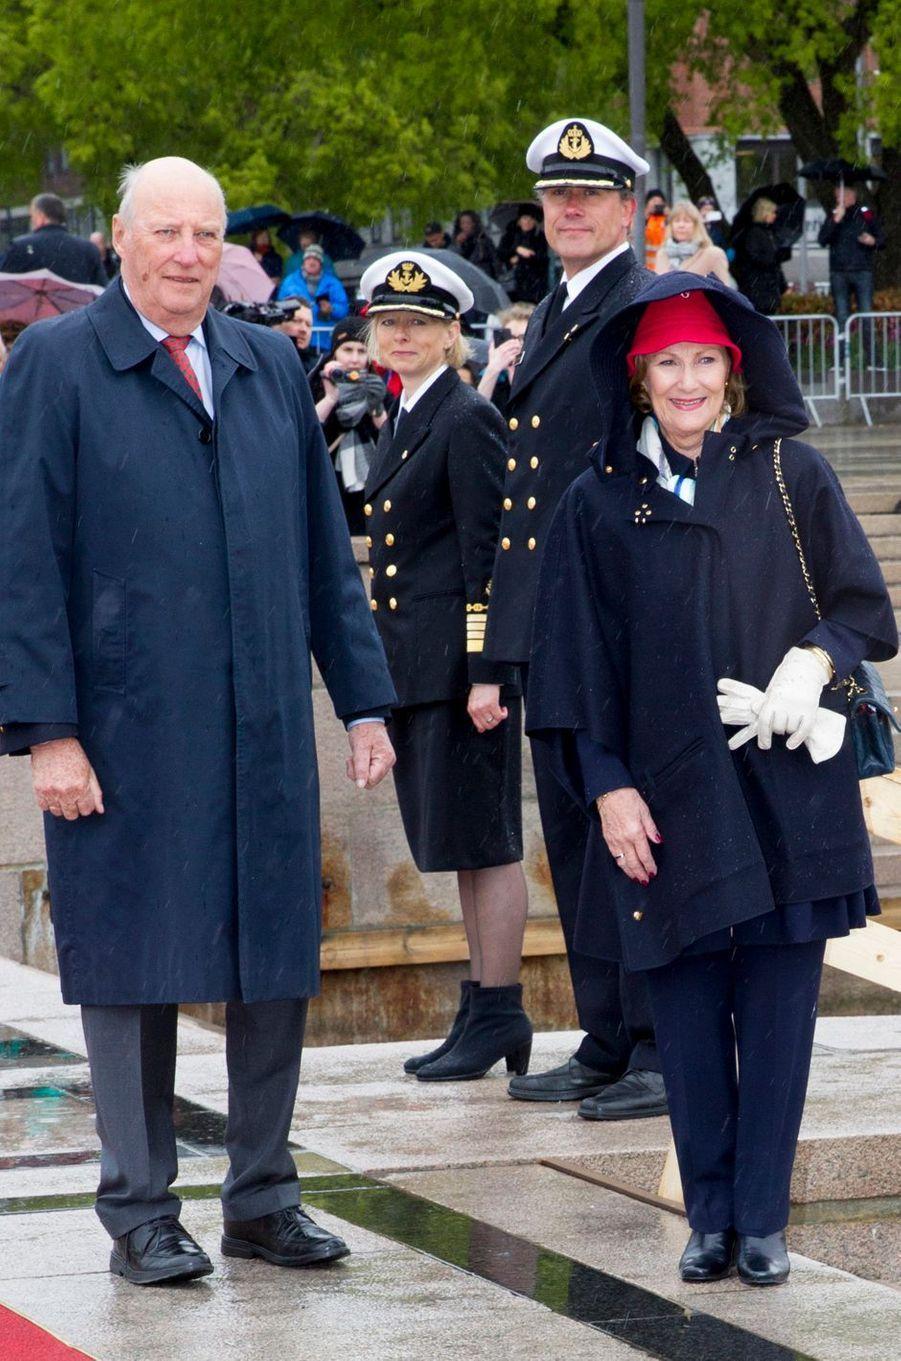 Le roi Harald V et la reine Sonja de Norvège à Oslo, le 10 mai 2017